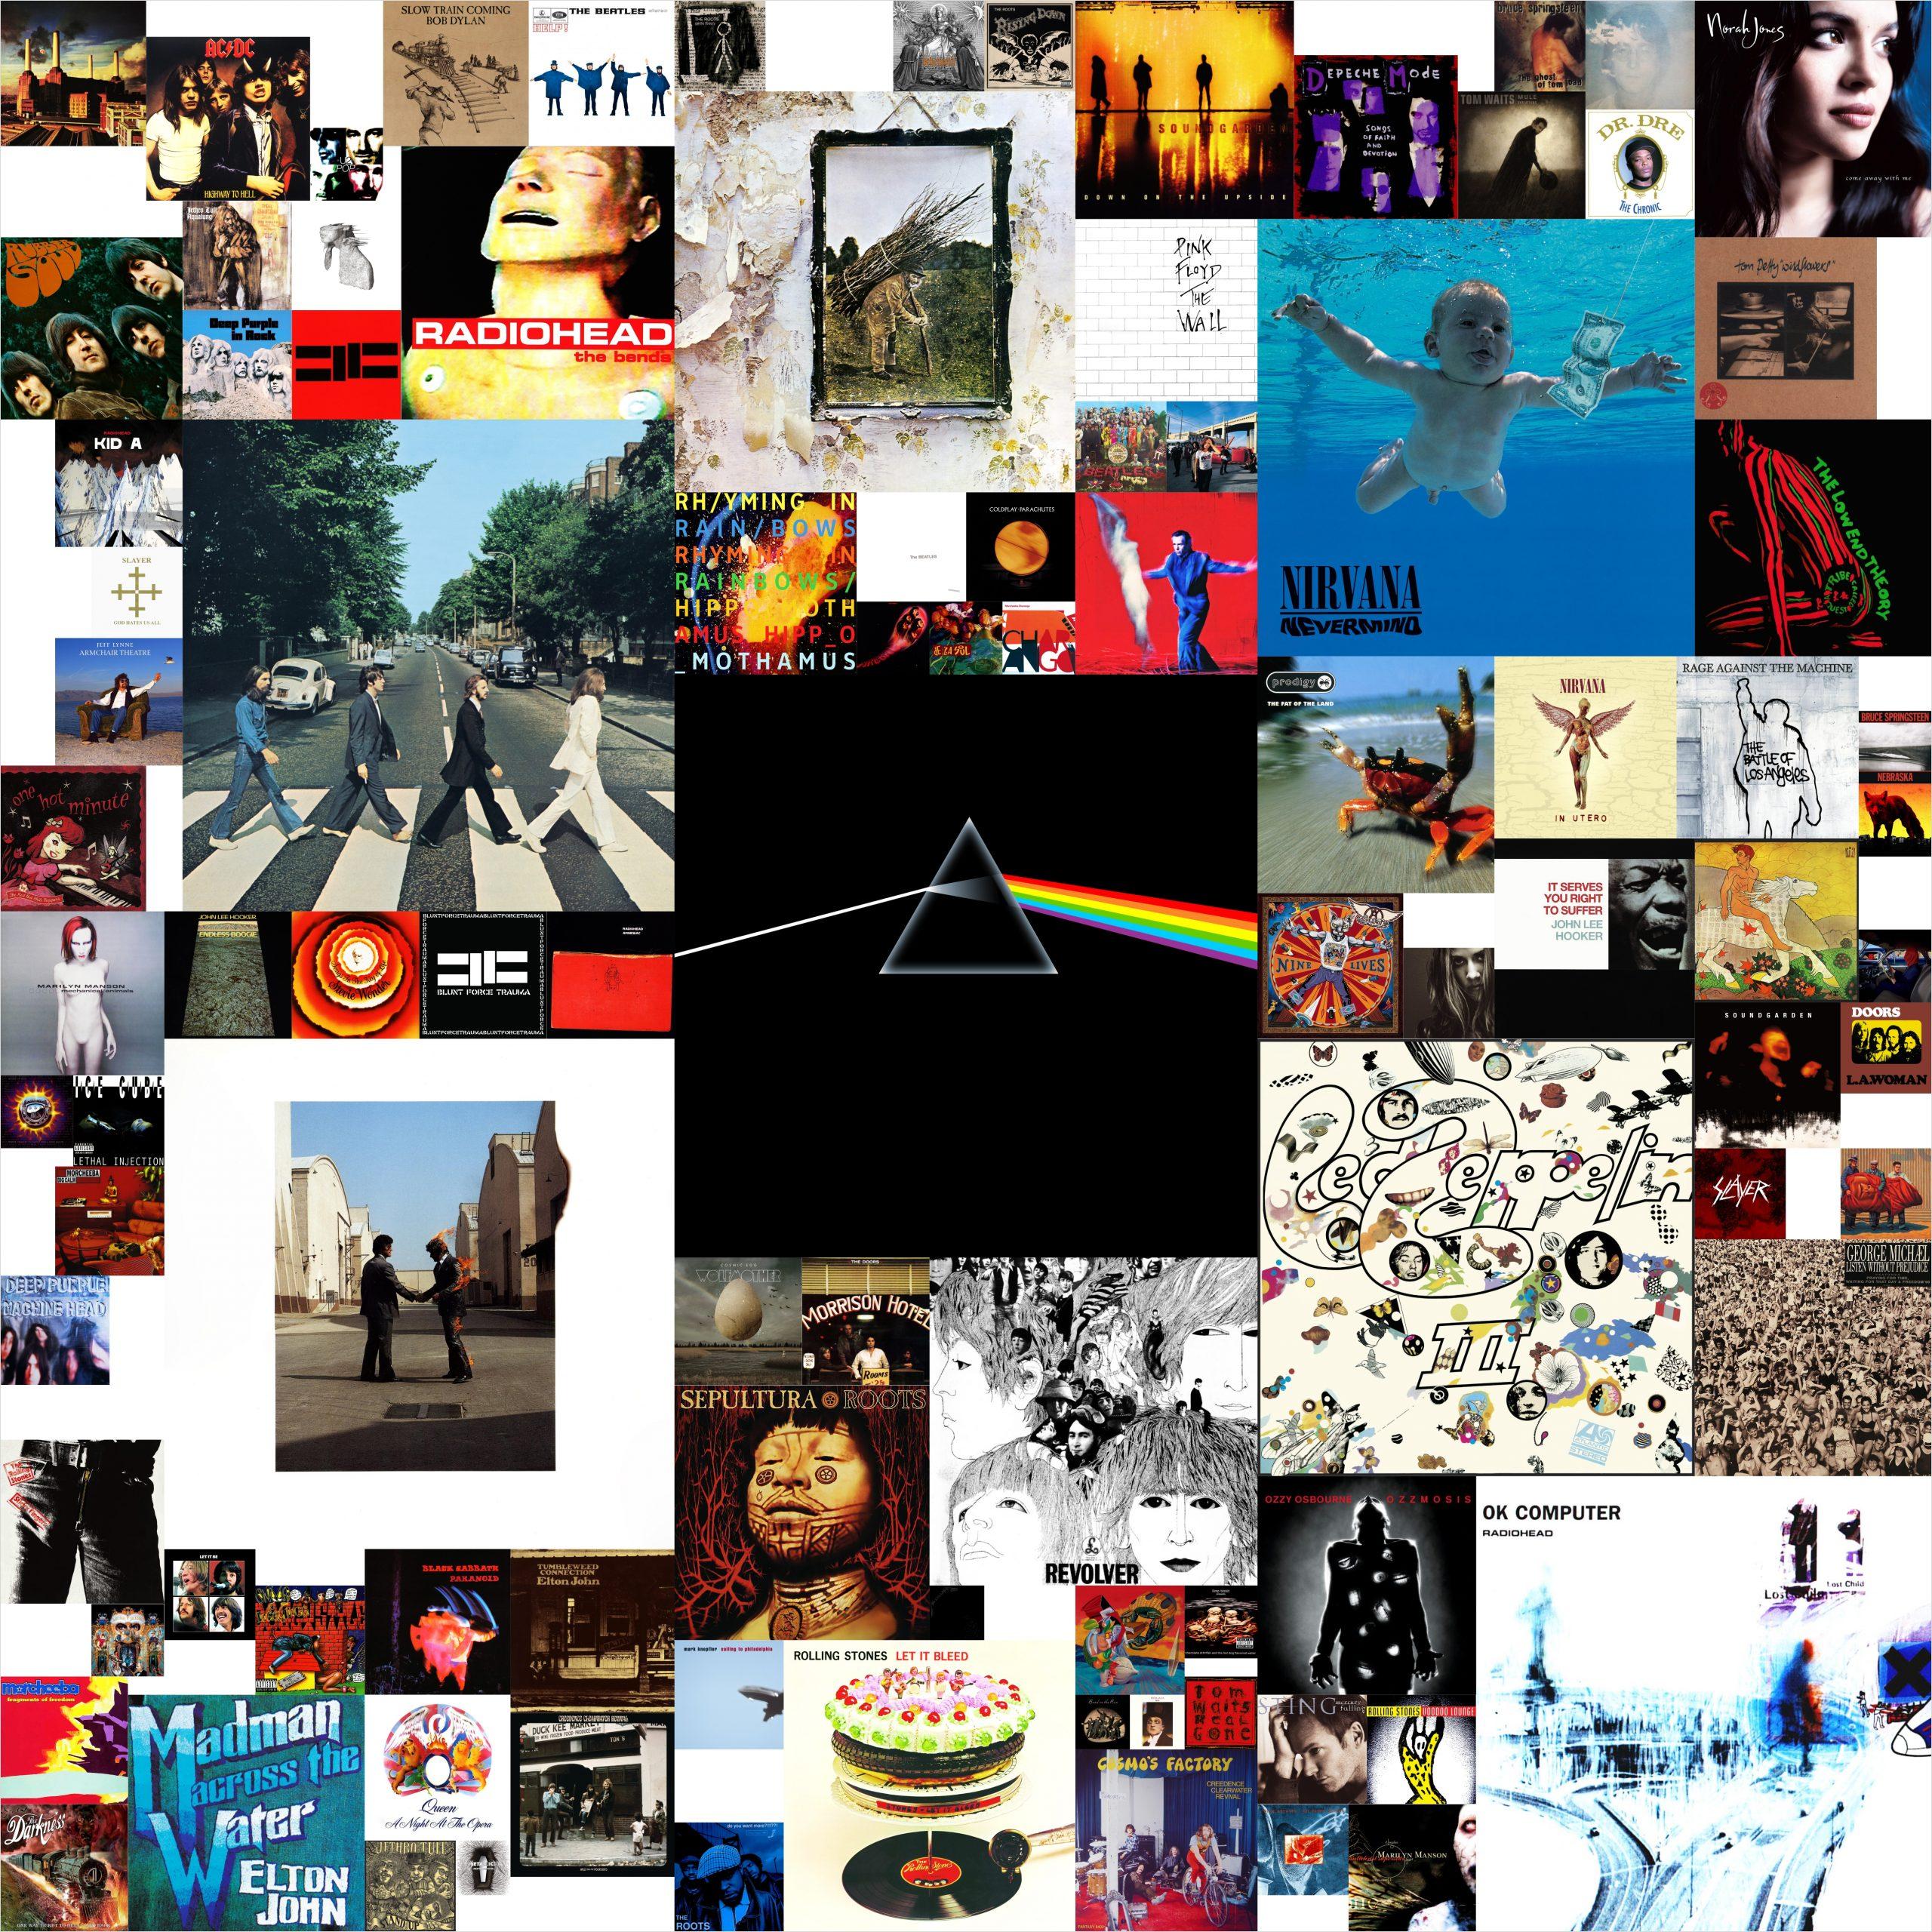 copyright - https://depositphotos.com/88732924/stock-photo-top-100-music-albums.html